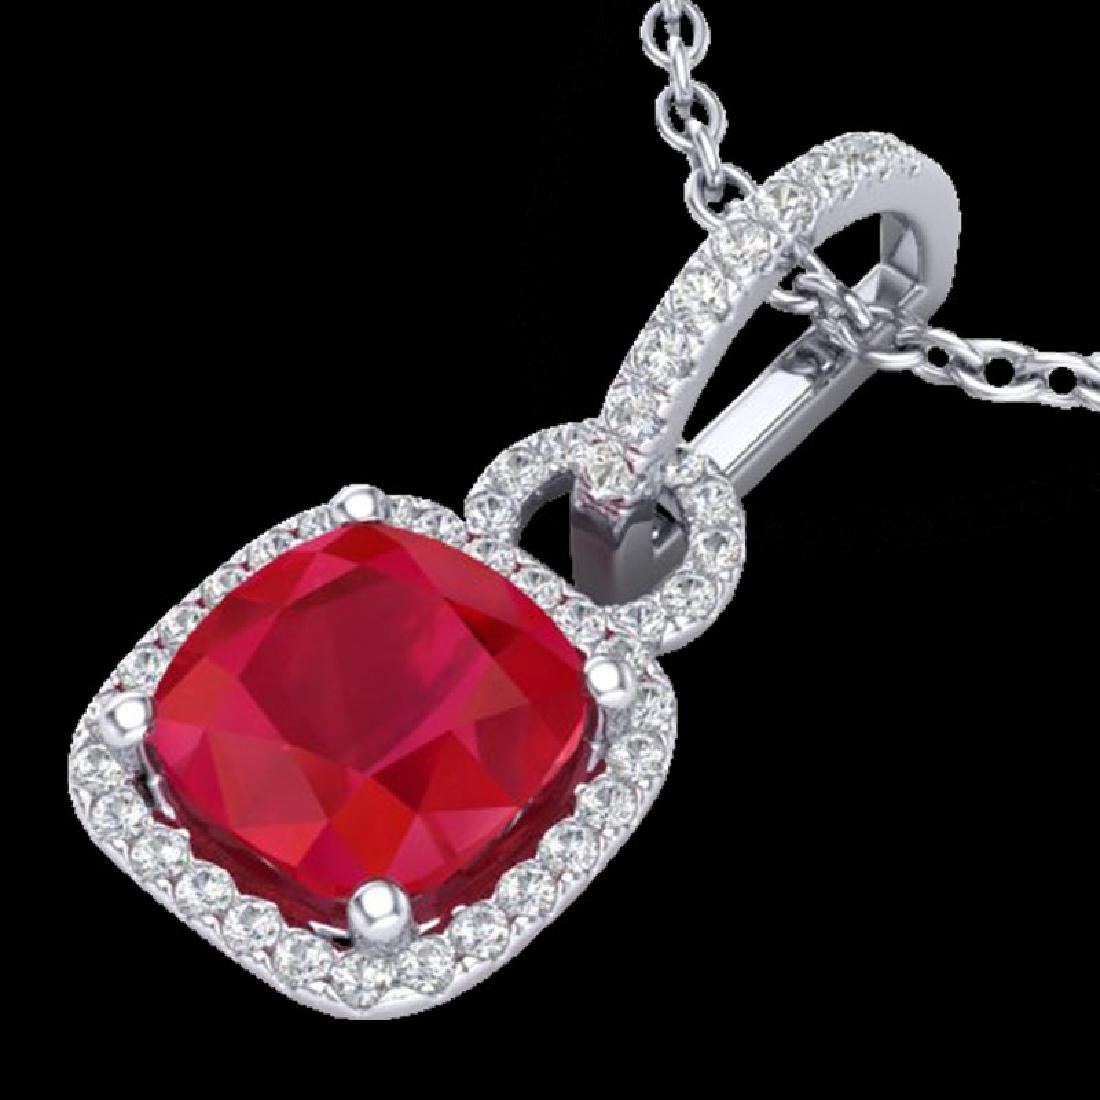 3 CTW Ruby & Micro VS/SI Diamond Necklace 18K White